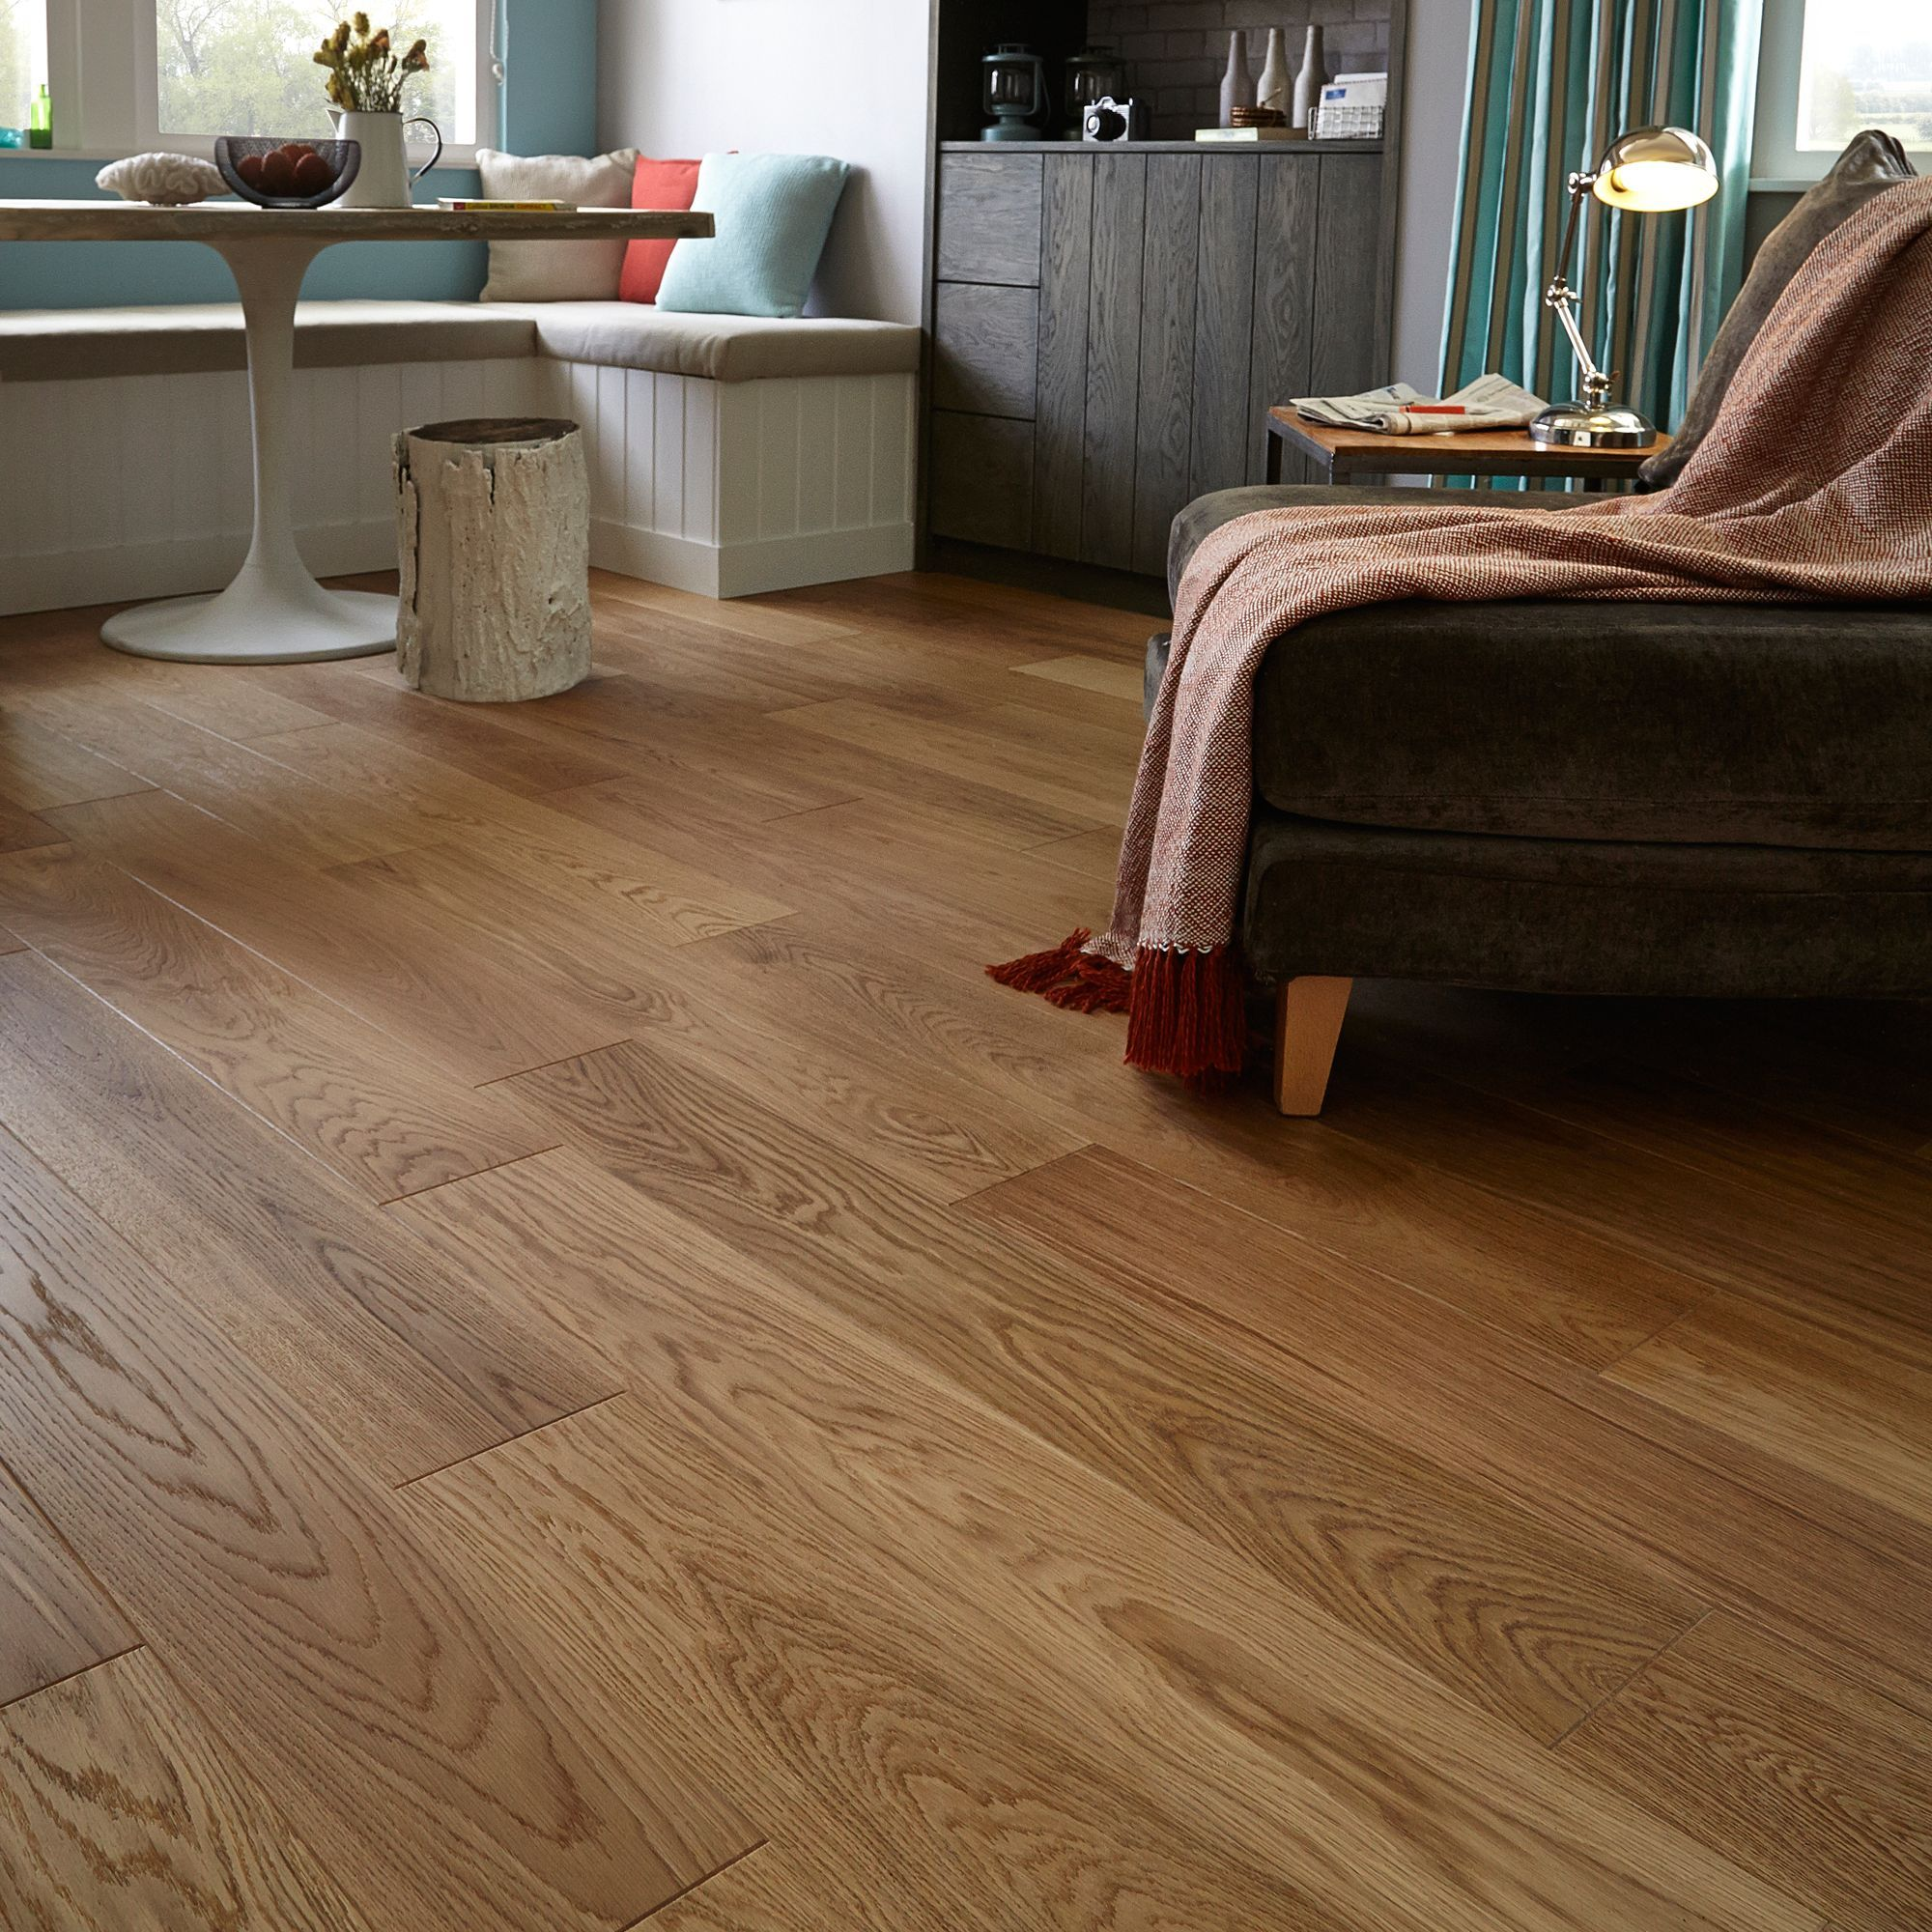 QuickStep Cadenza Natural Oak Real Wood Top Layer